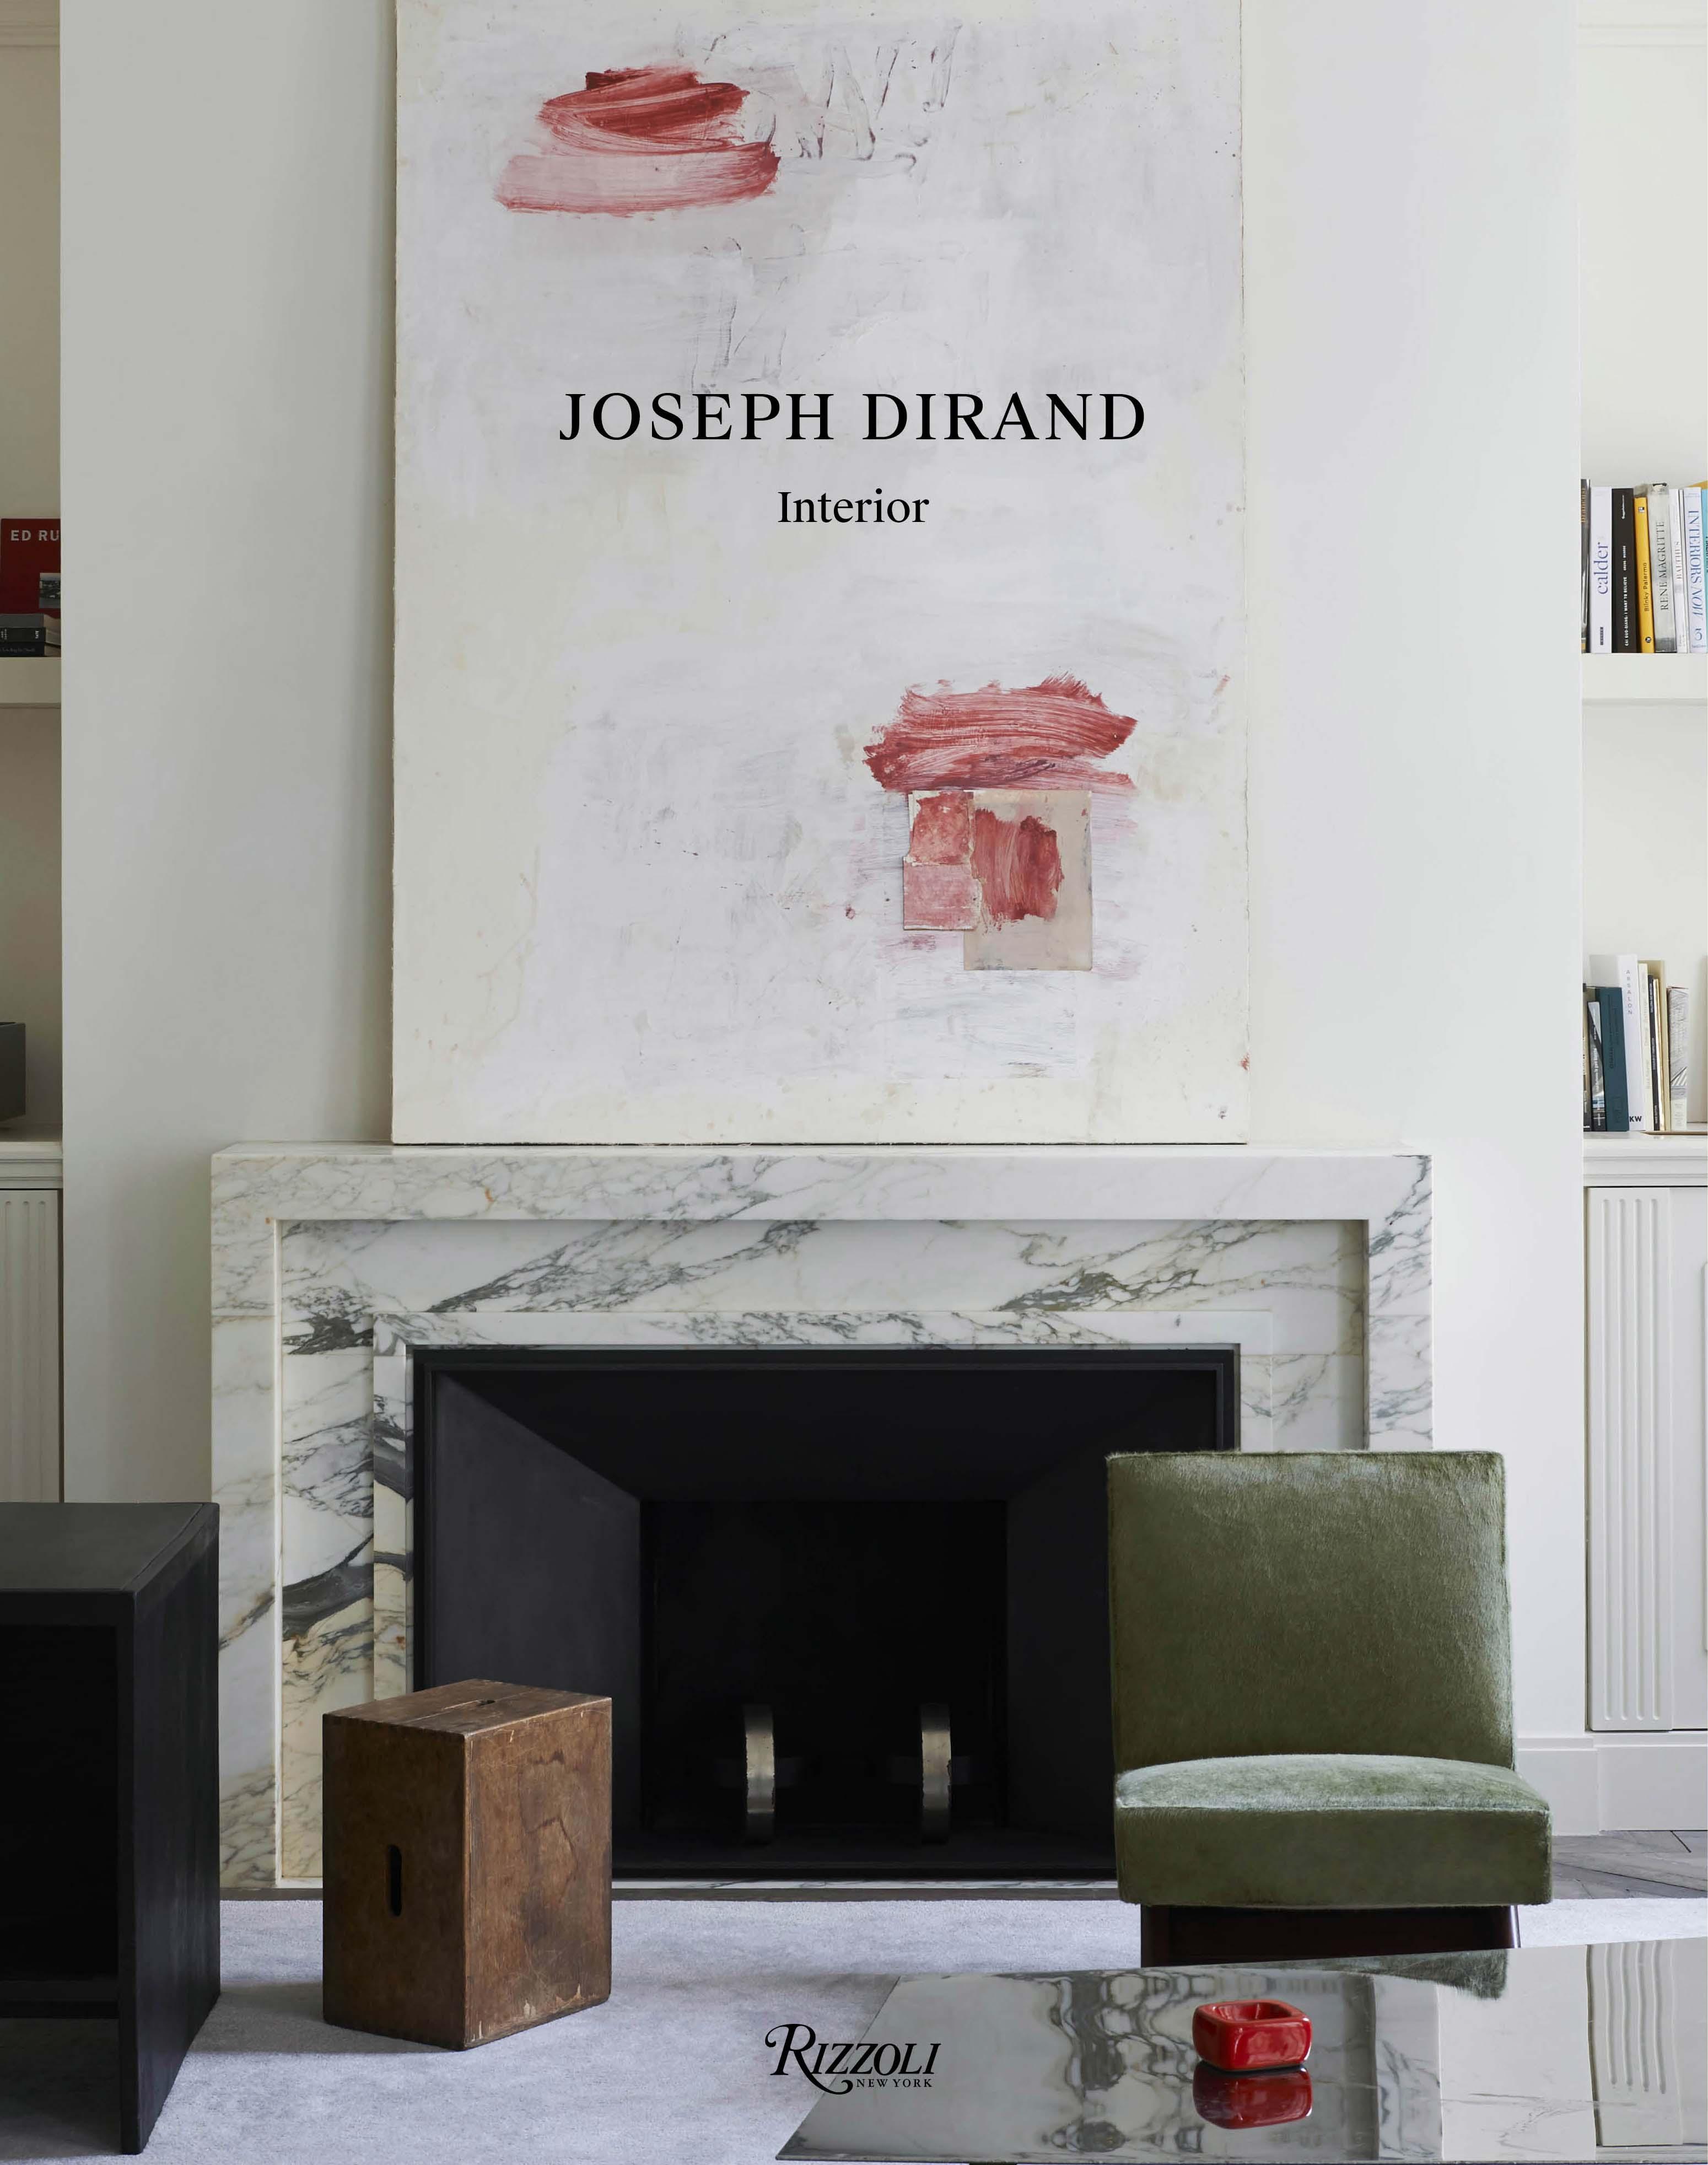 Joseph Dirand: Interior - design, culture - StyleZeitgiest, Joseph Dirand, Eugene Rabkin, Design, Culture, 2017